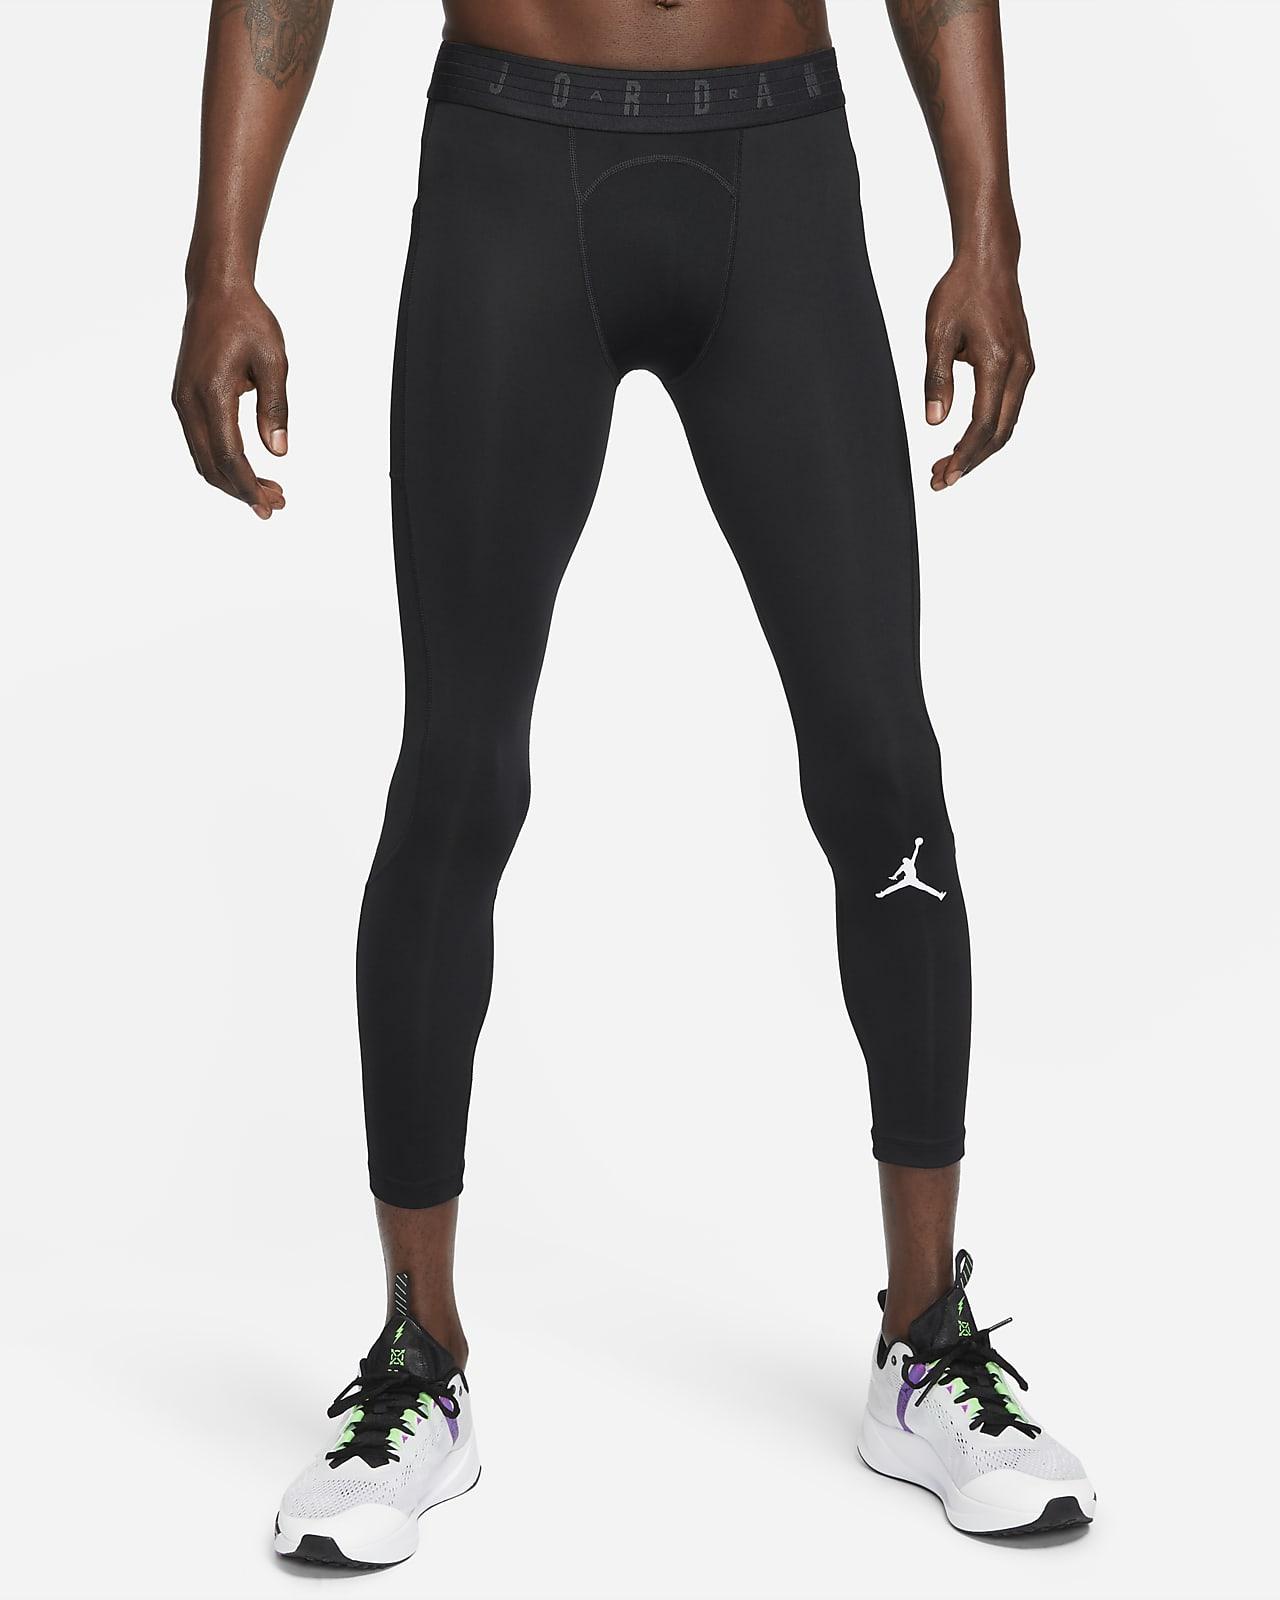 Legging 3/4 Jordan Dri-FIT Air pour Homme. Nike LU